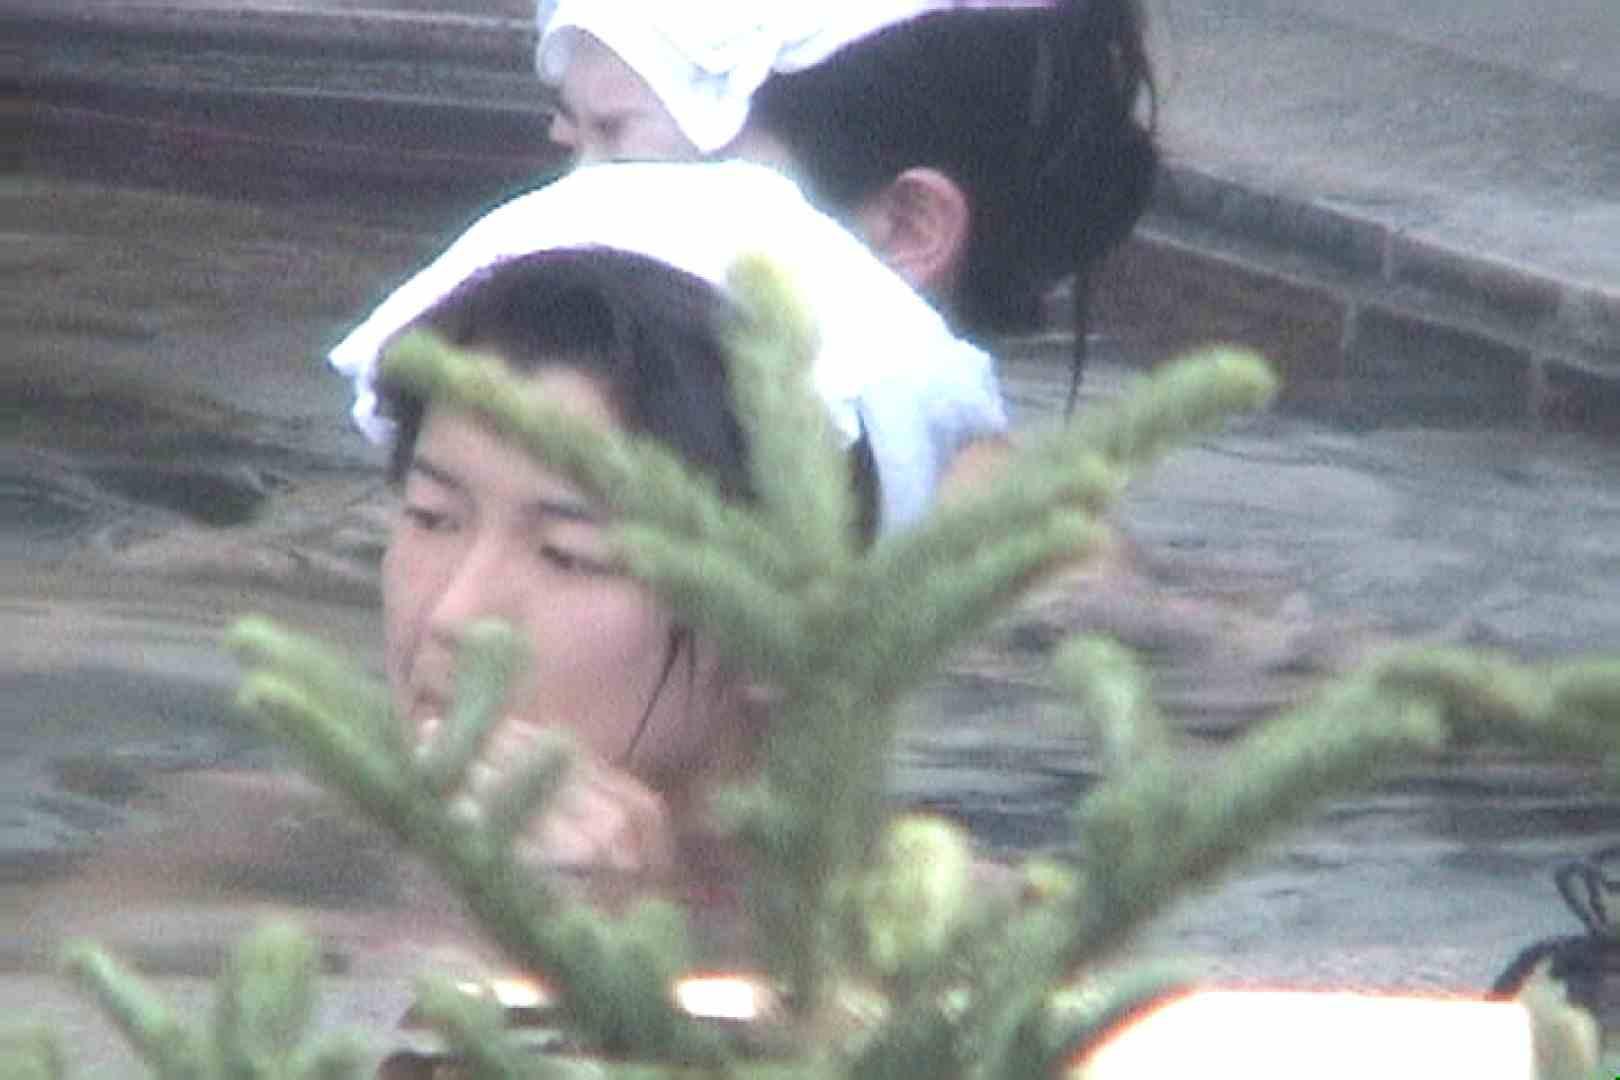 Aquaな露天風呂Vol.80【VIP限定】 盗撮 | HなOL  66pic 59